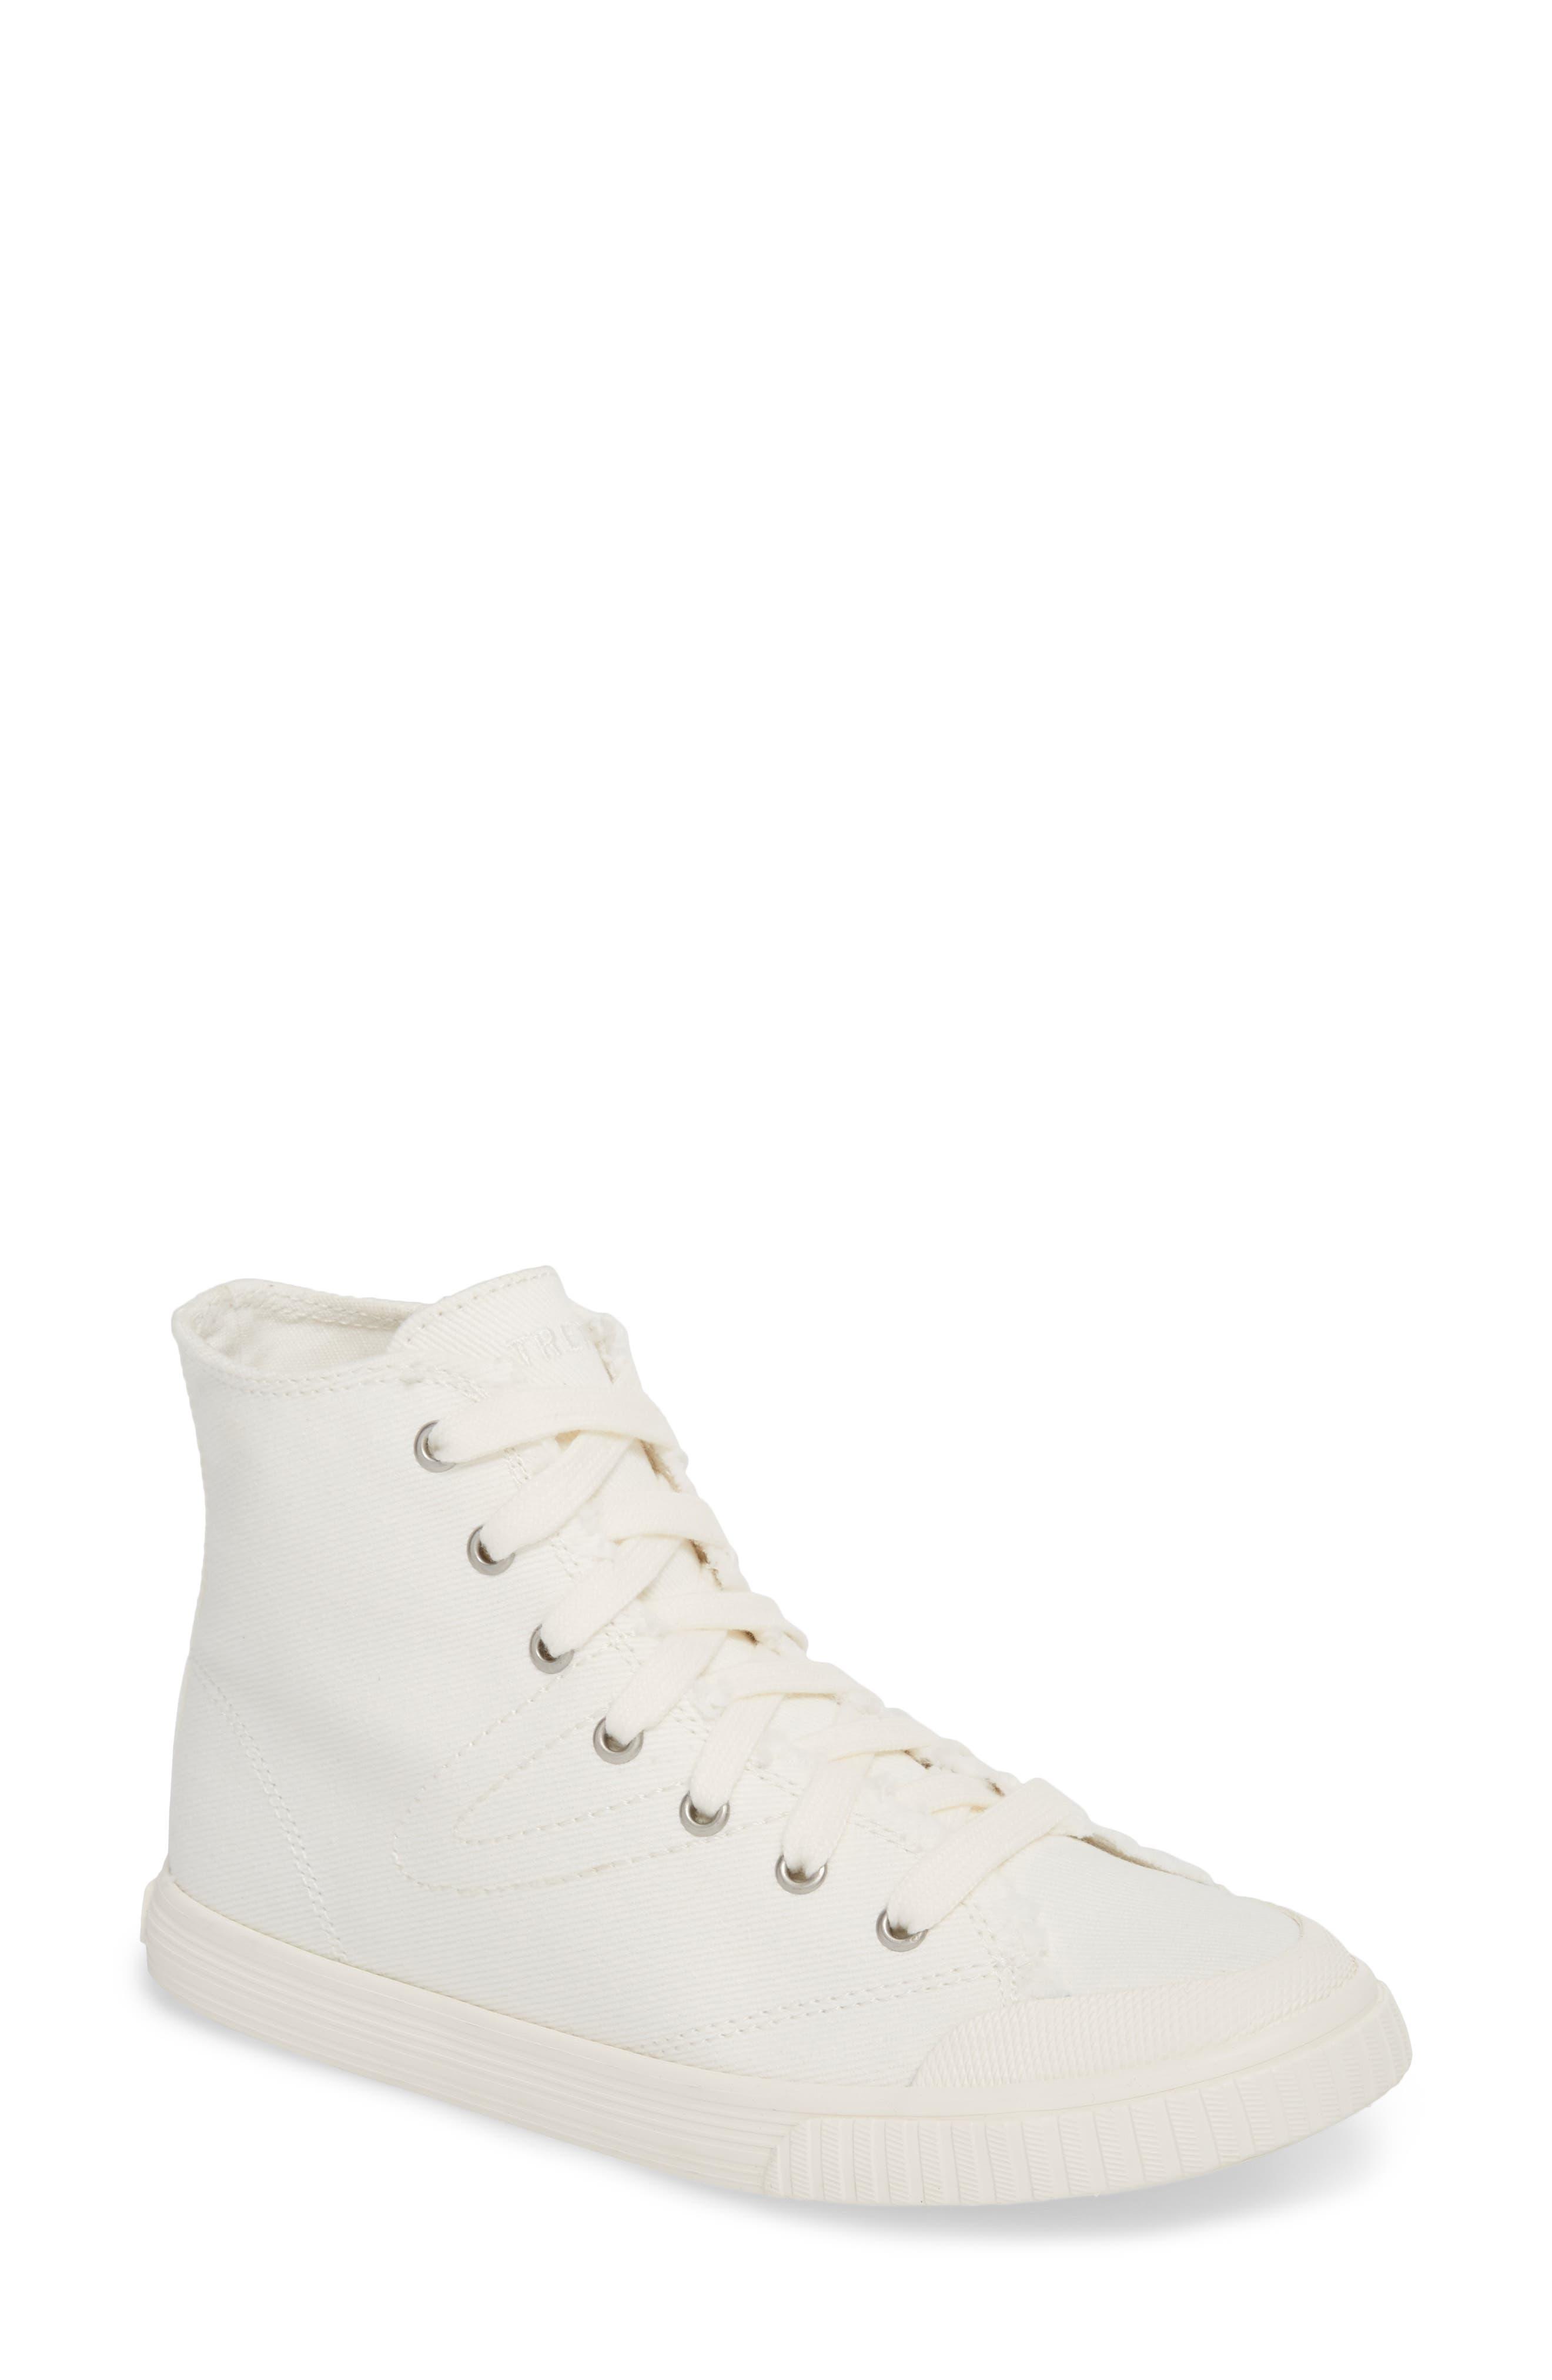 Marley 2 High Top Sneaker,                             Main thumbnail 1, color,                             150